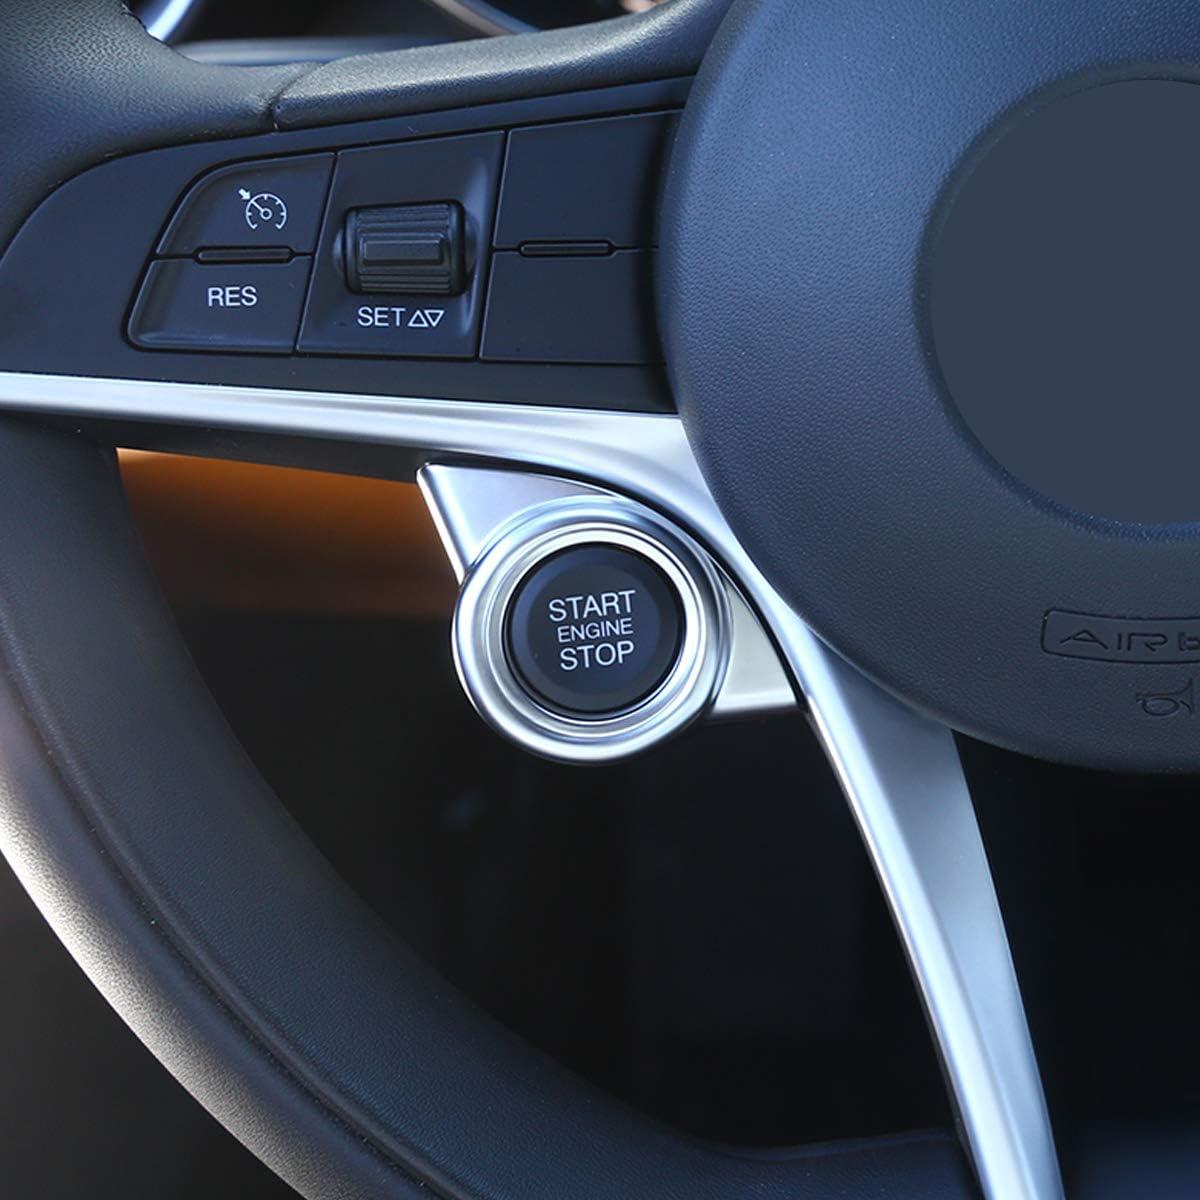 Cubierta para parada de motor de arranque de coche ABS, plateada, mate, para Giulia Stelvio 2017 2018 2019 DIYUCAR